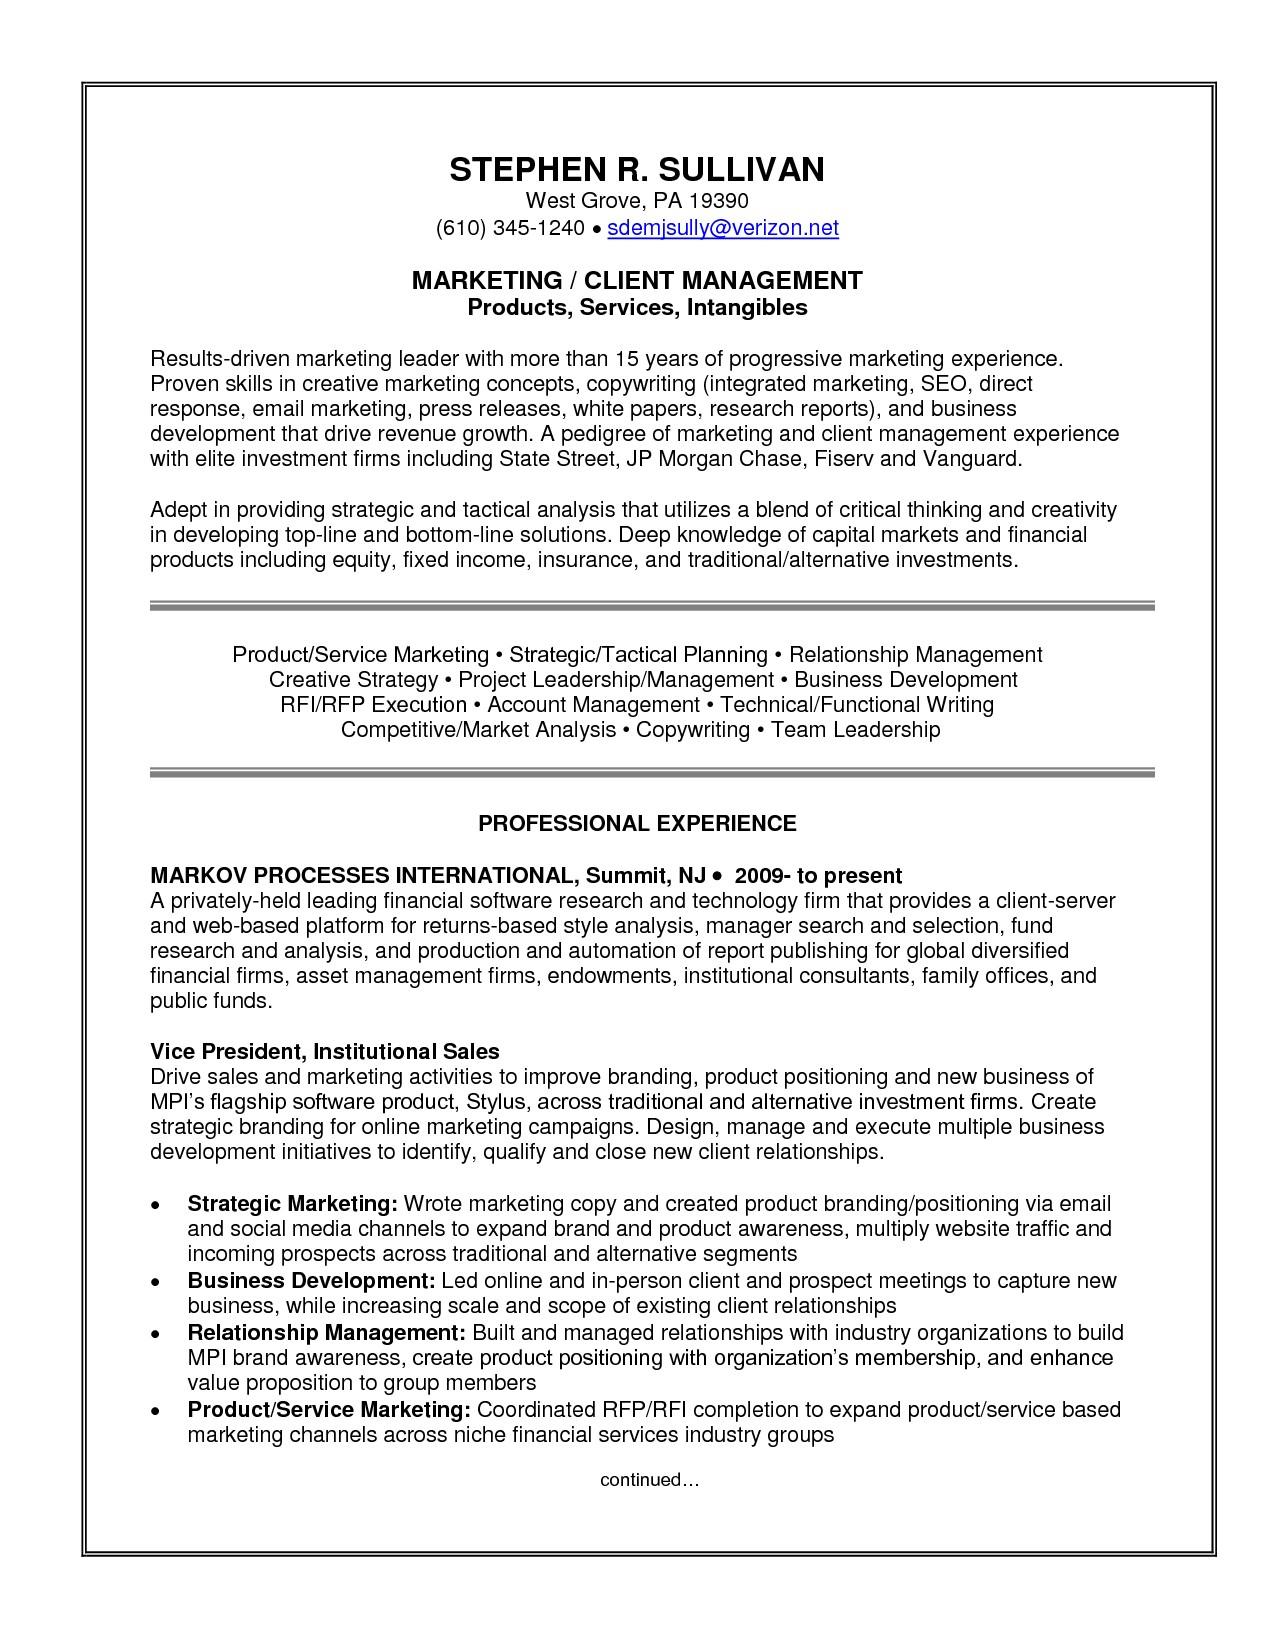 Insurance Marketing Letter Template - Beautiful Proof Insurance Letter Template